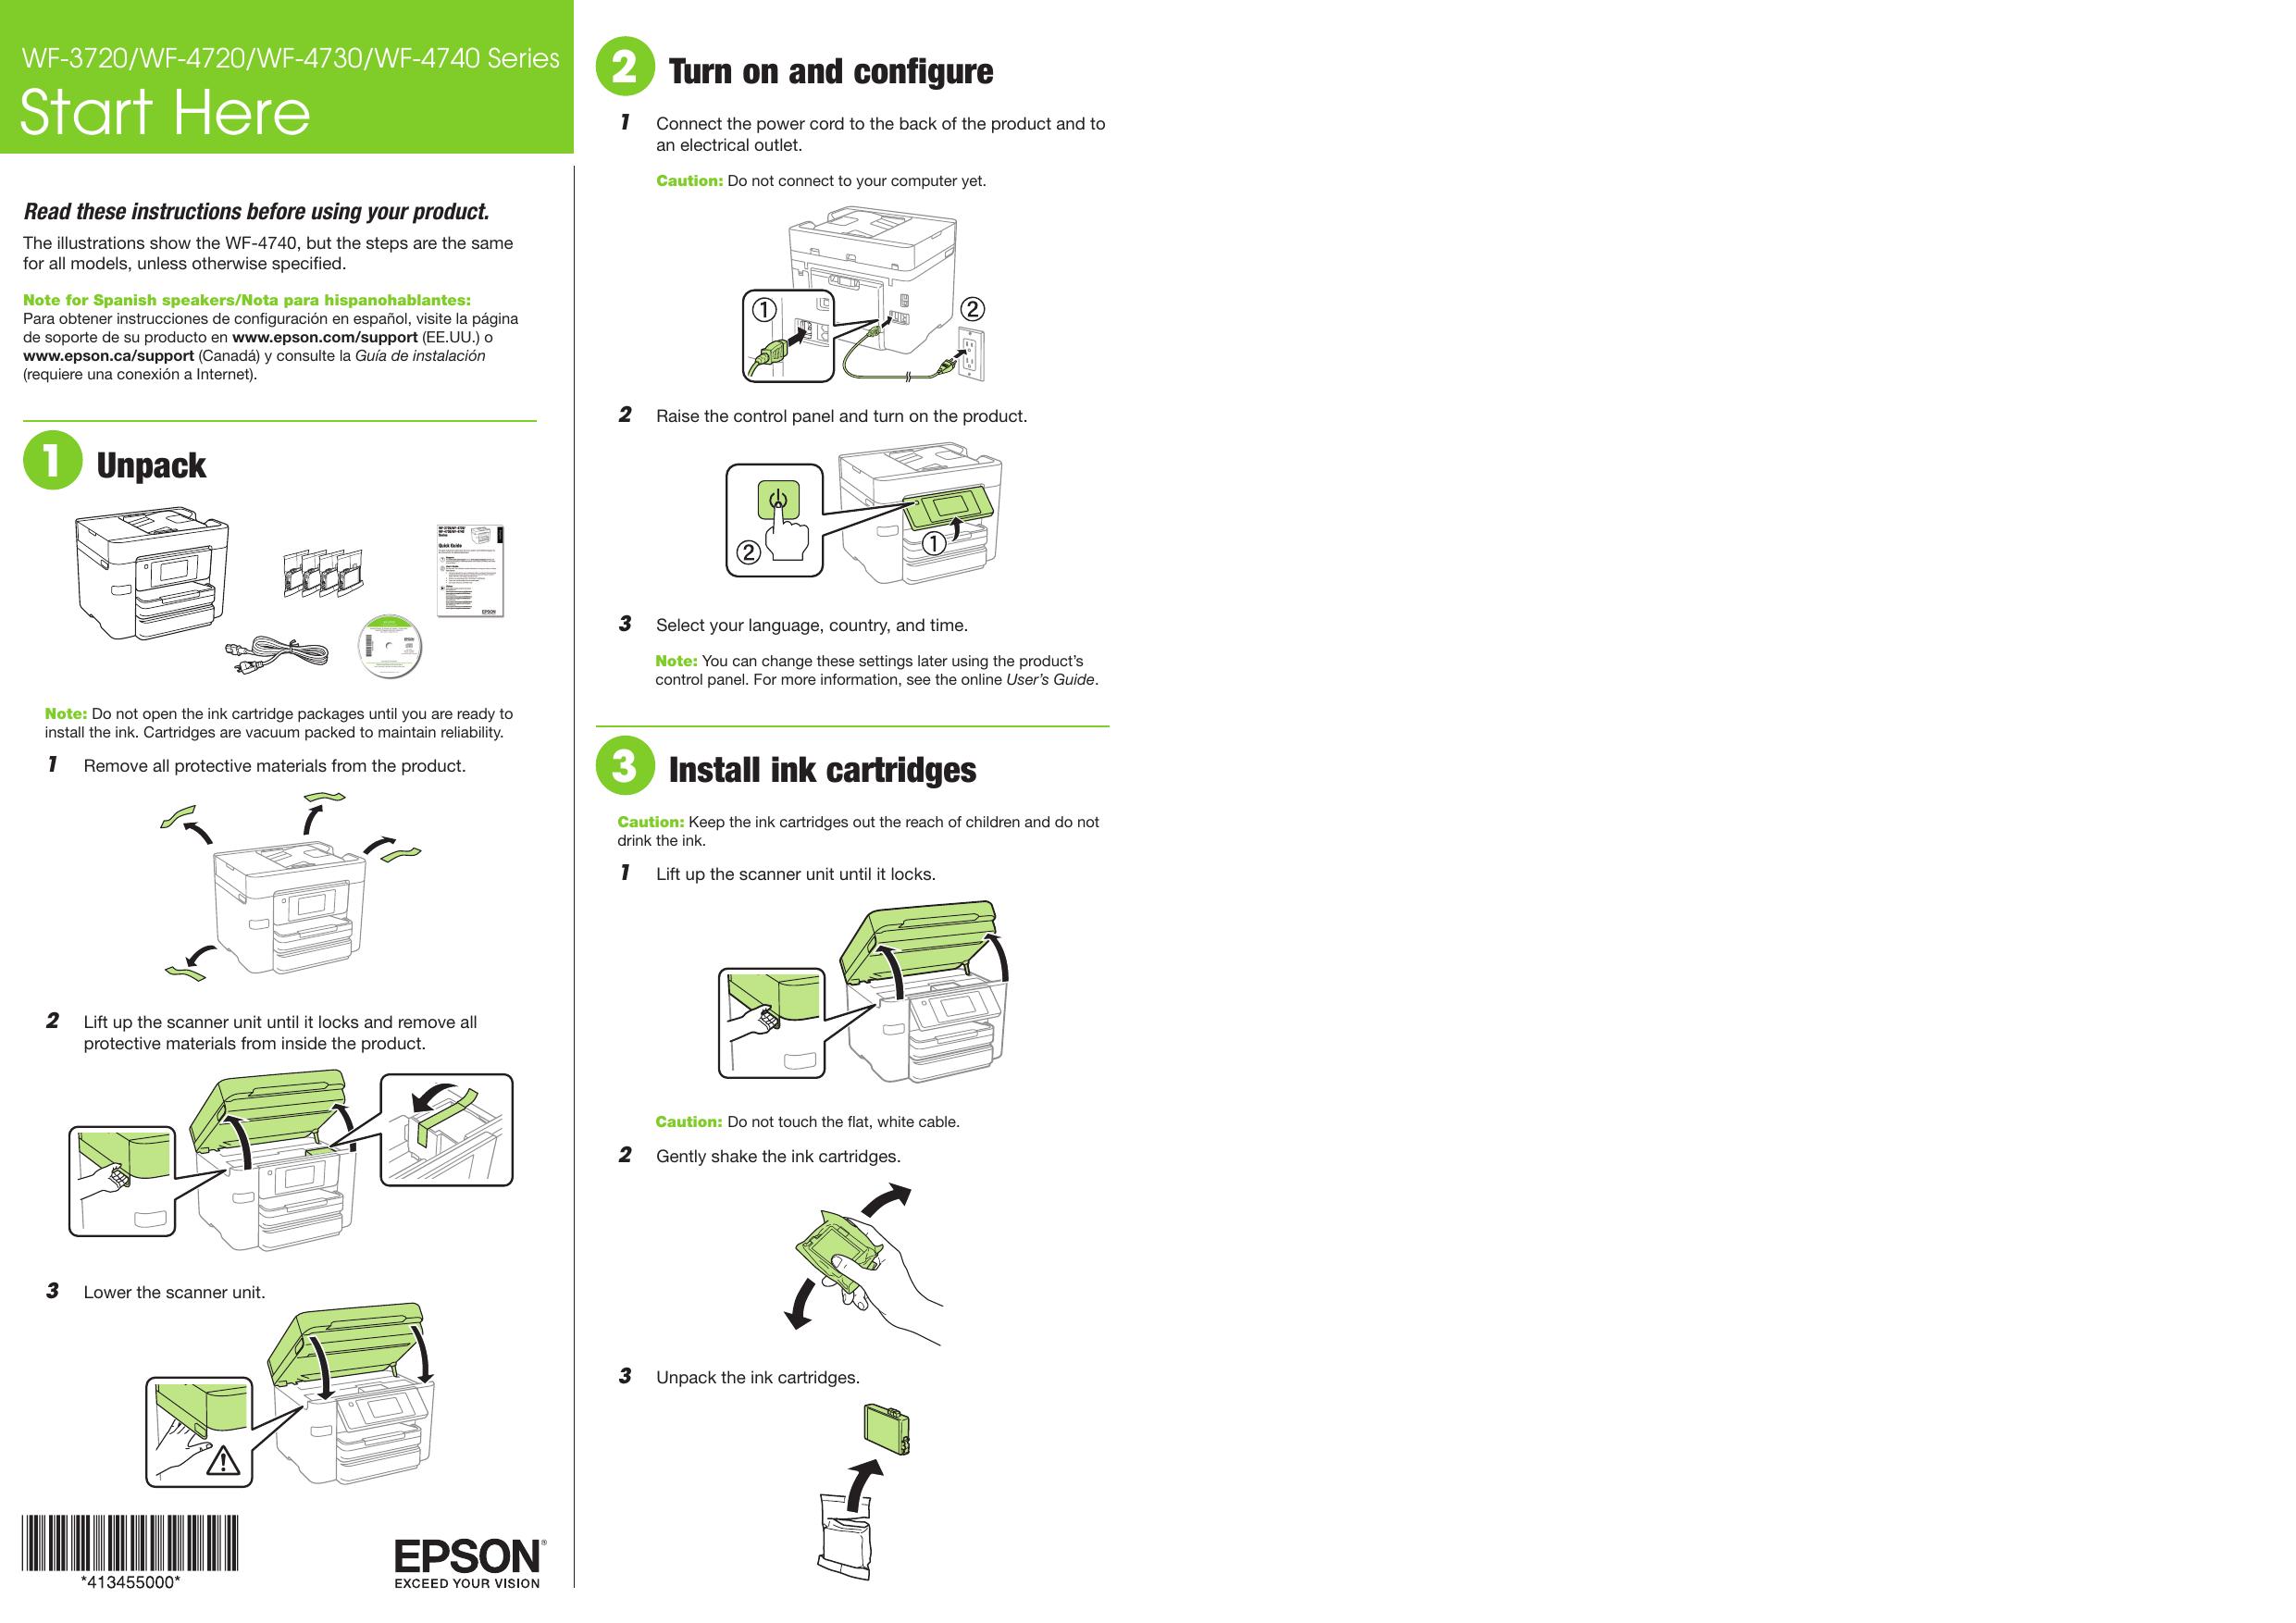 Epson Start Here WF 3720/WF 4720/WF 4730/WF 4740 Series